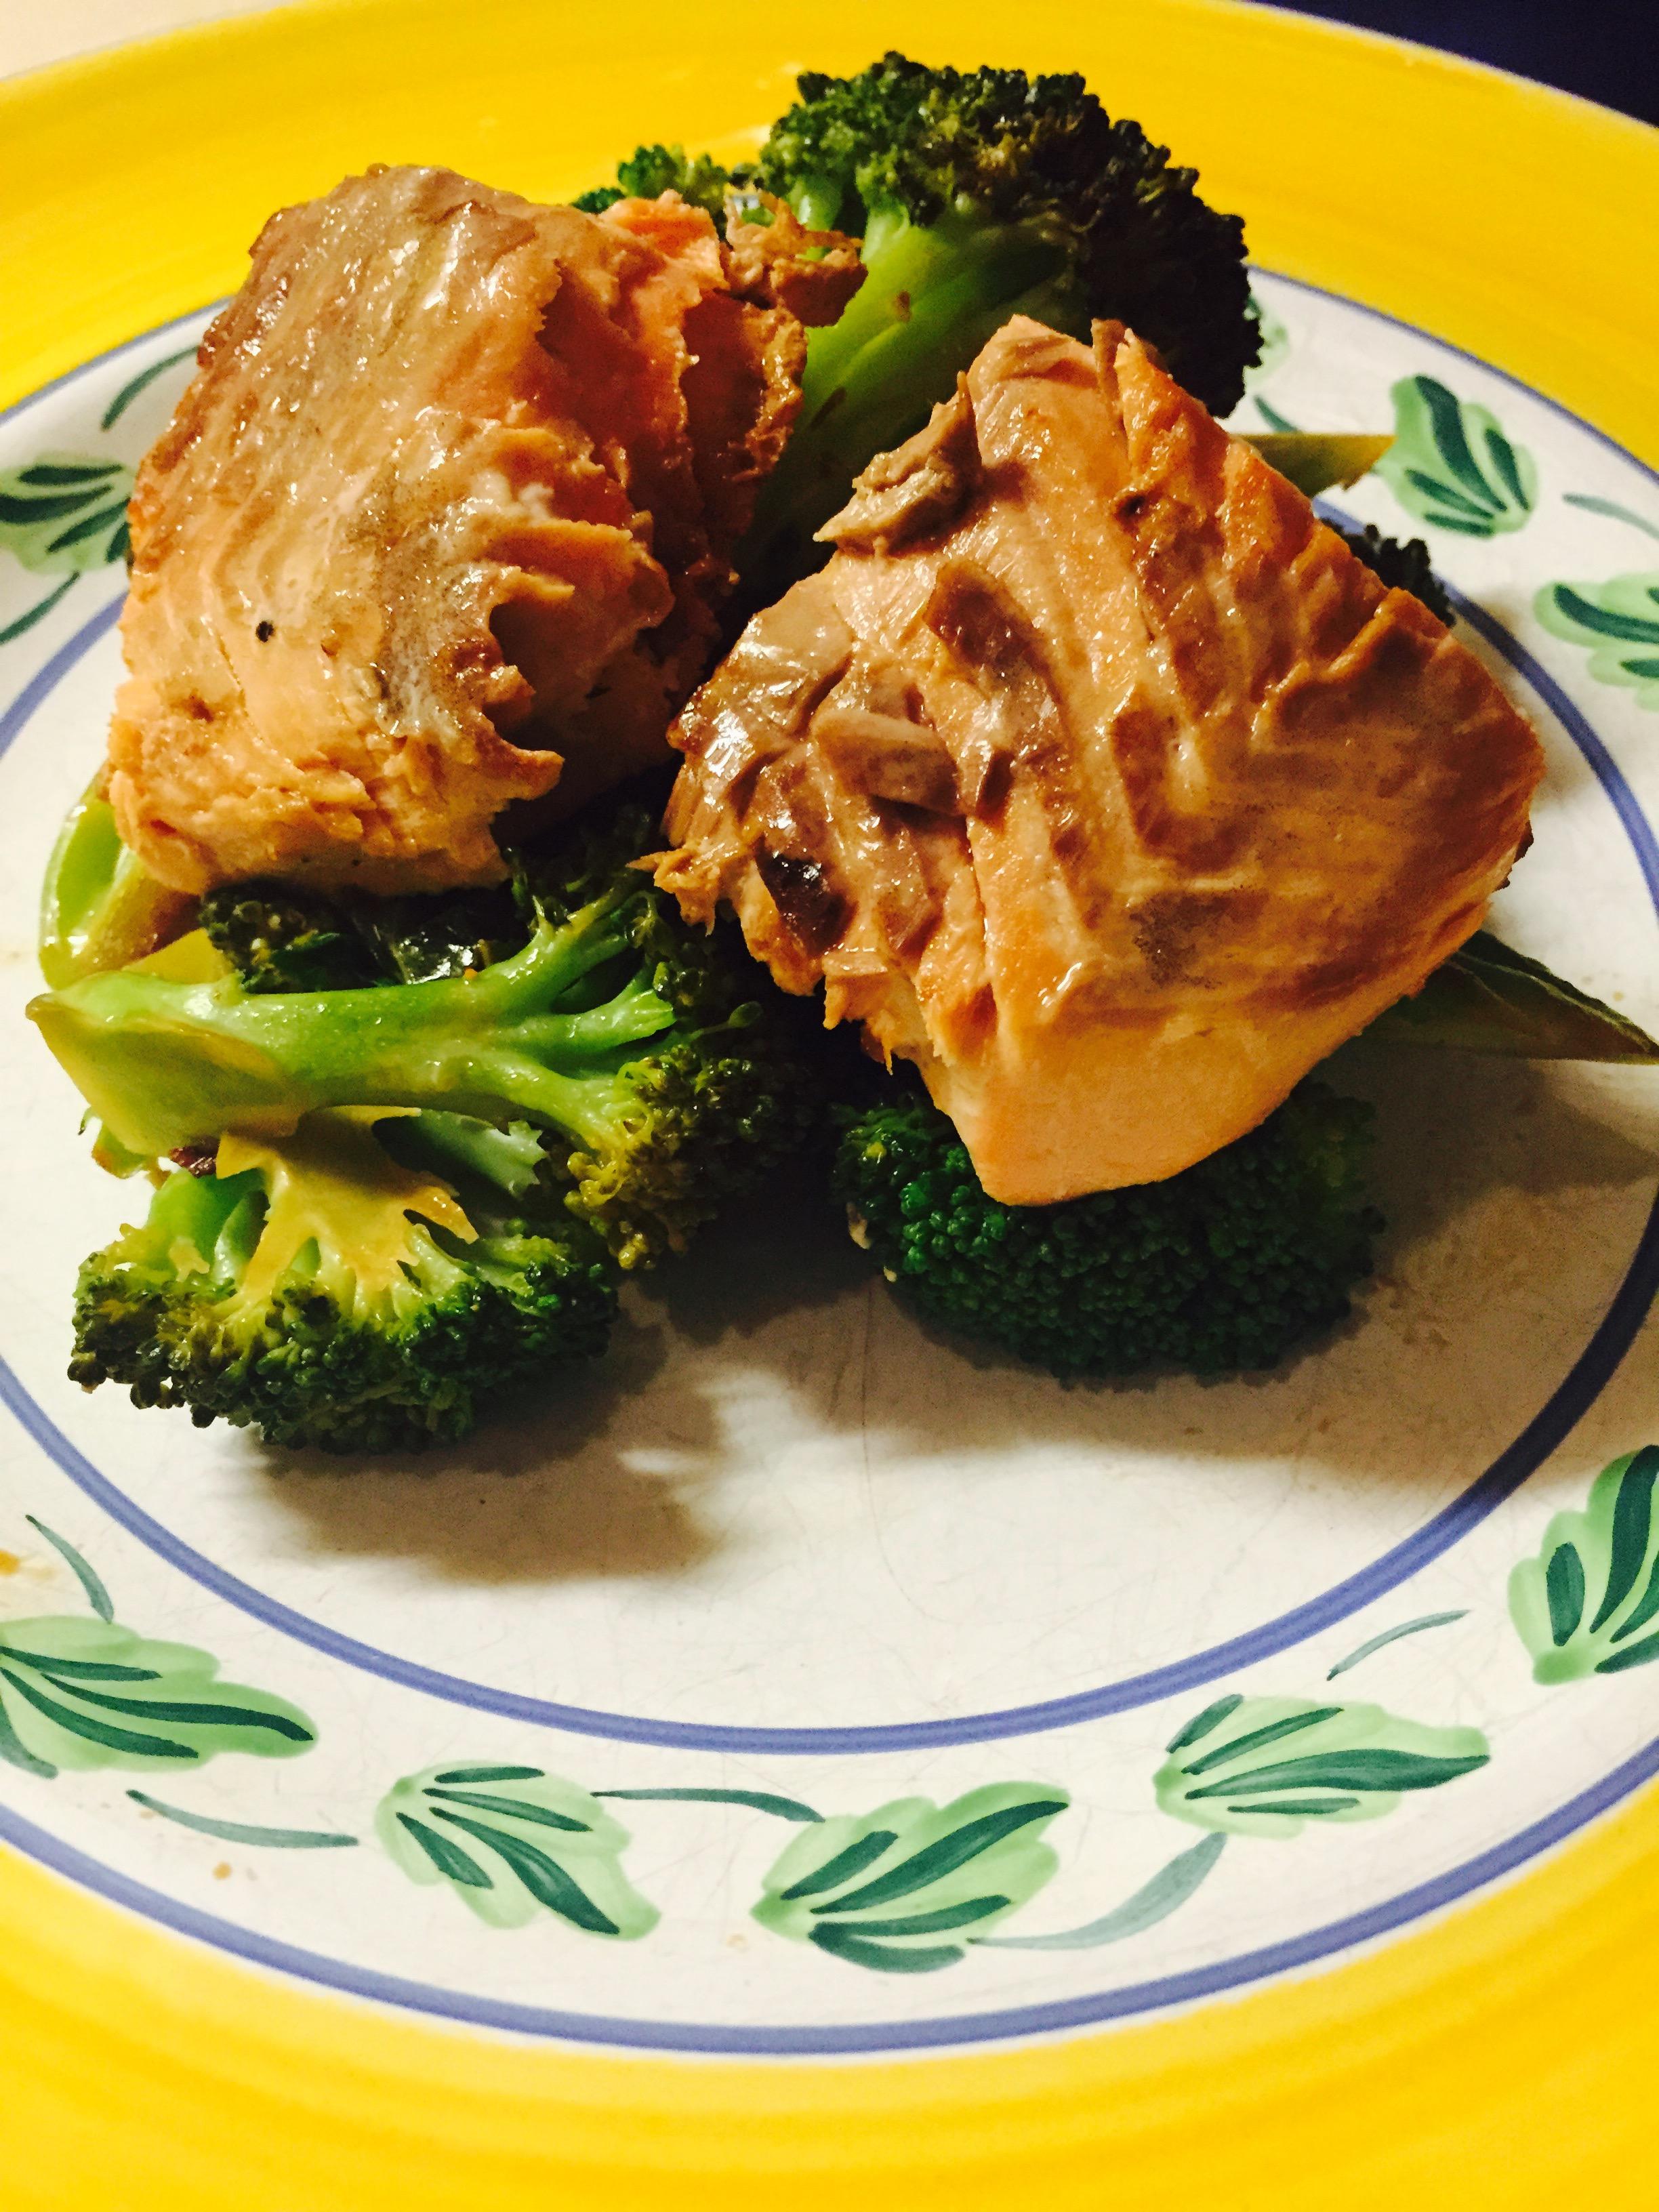 Seared salmon and broccoli